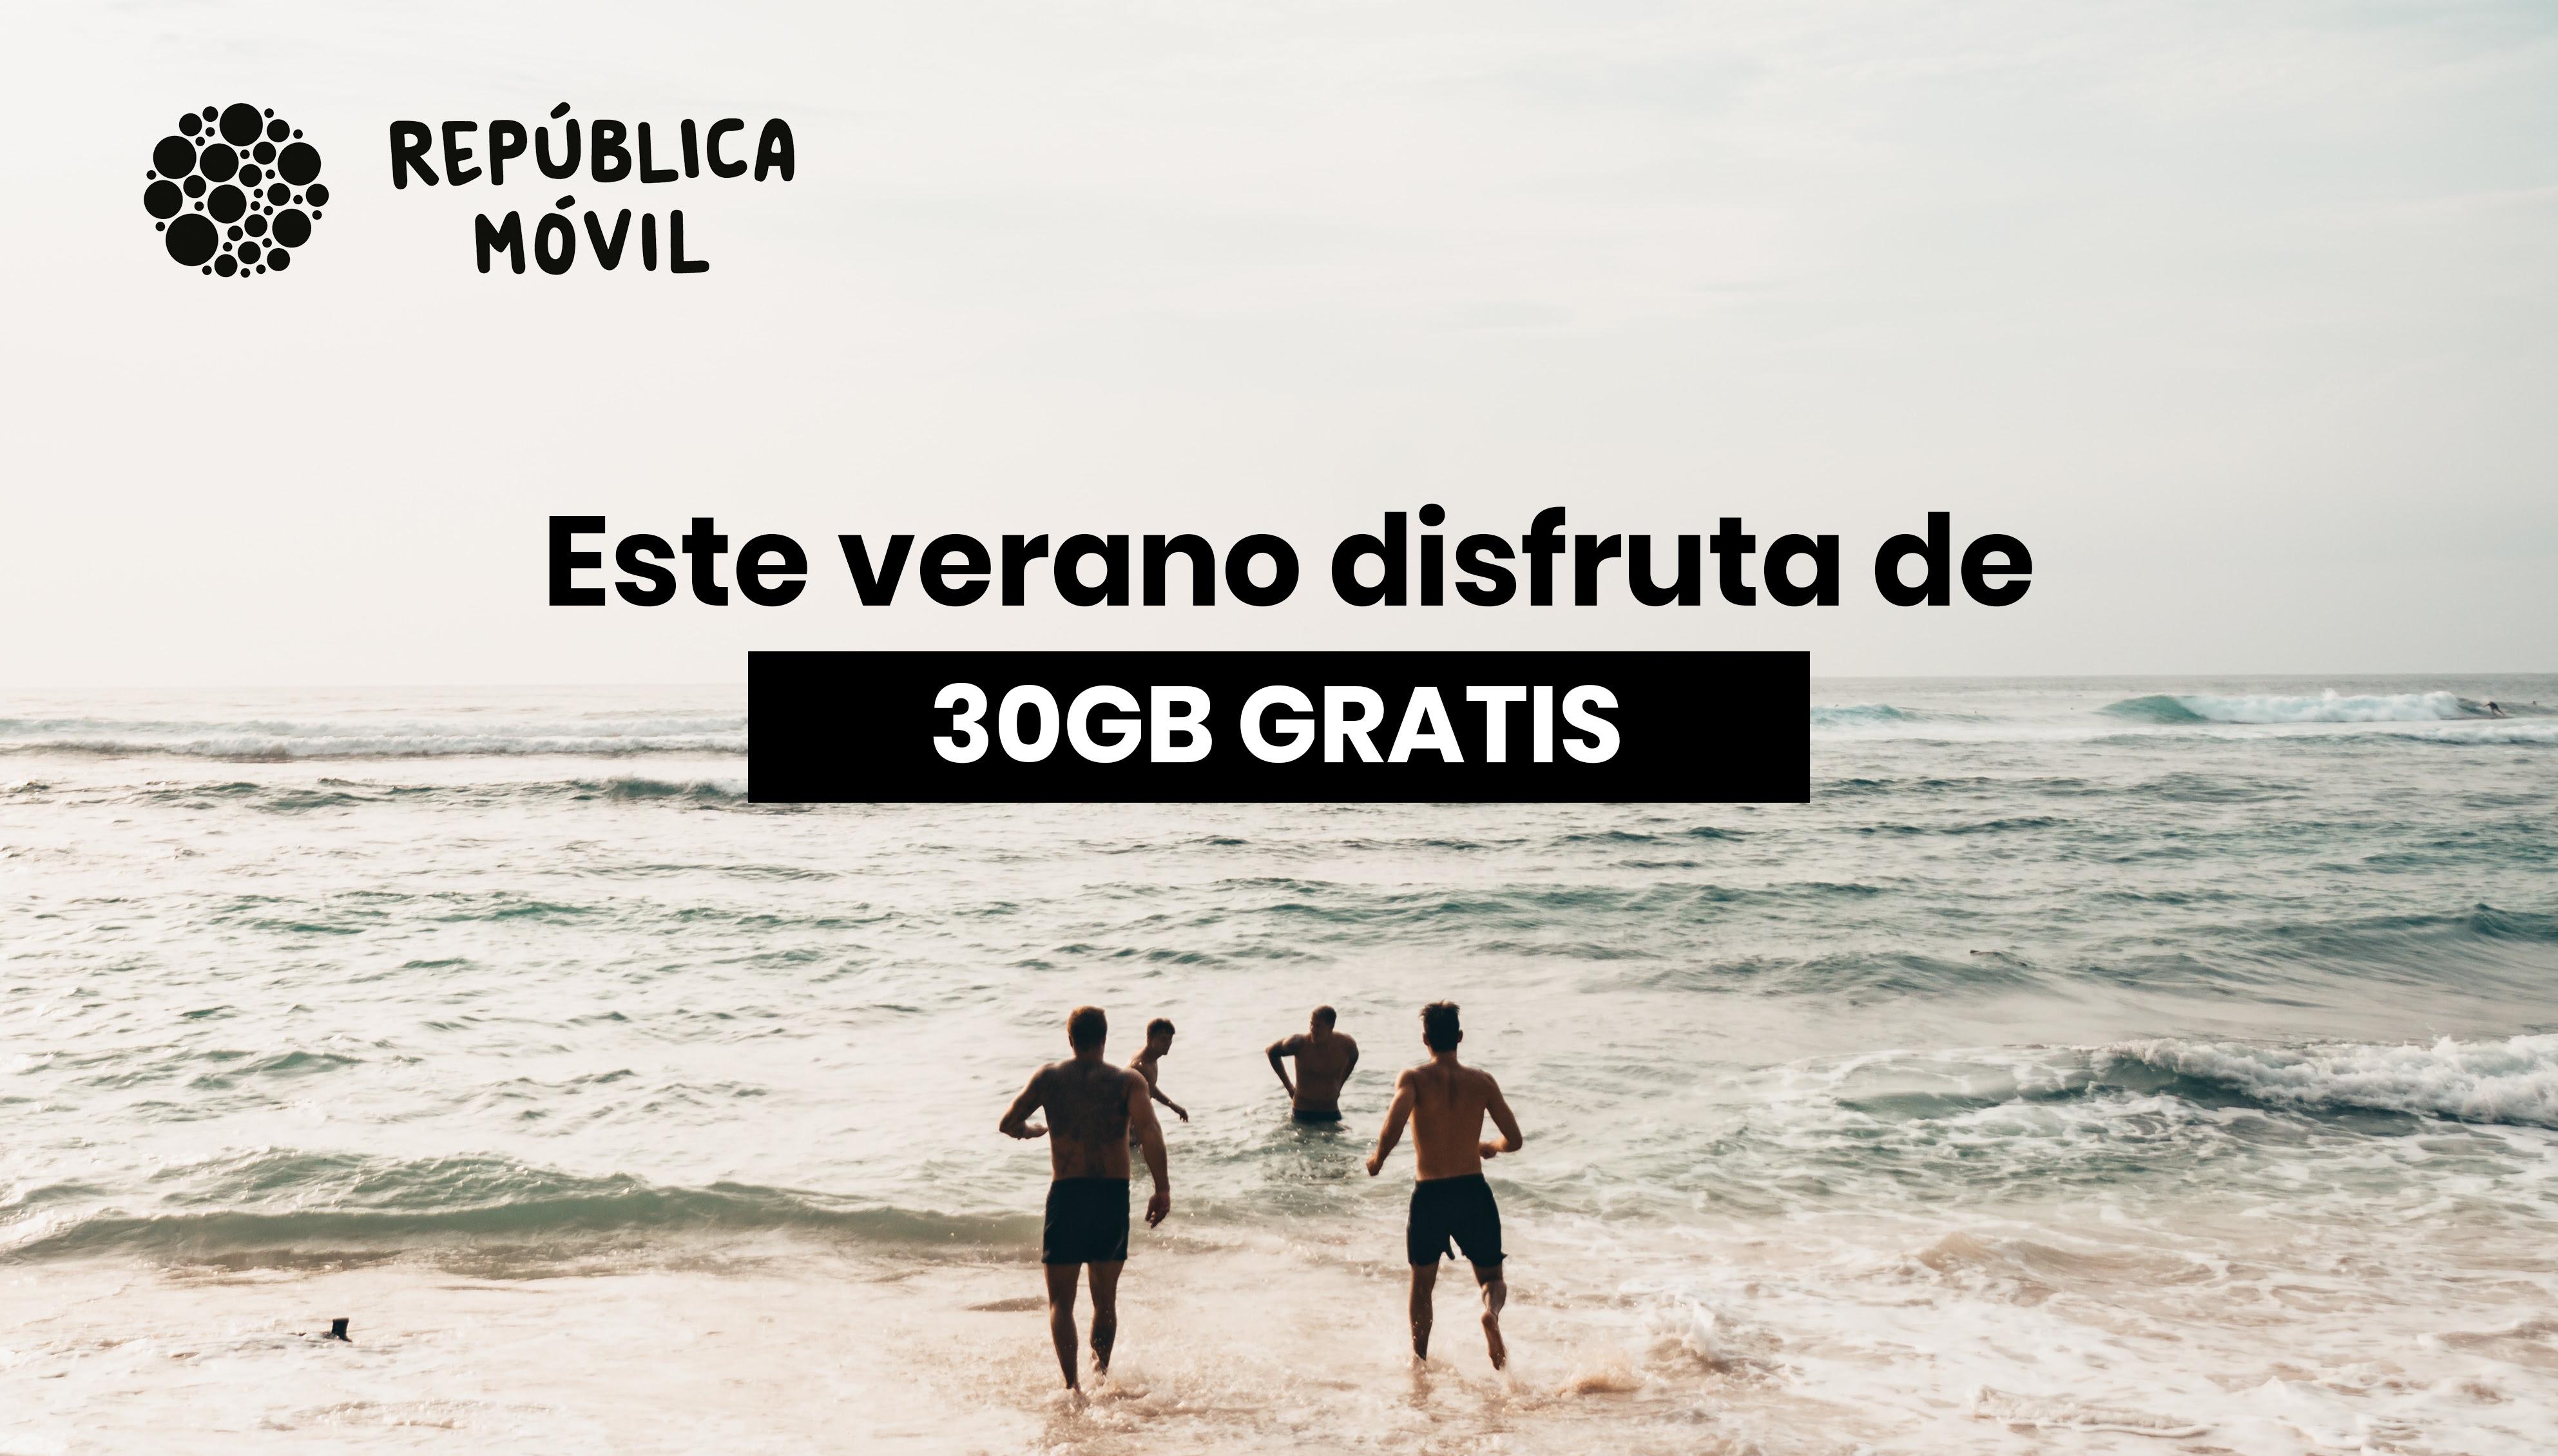 República móvil: 30GB gratis!